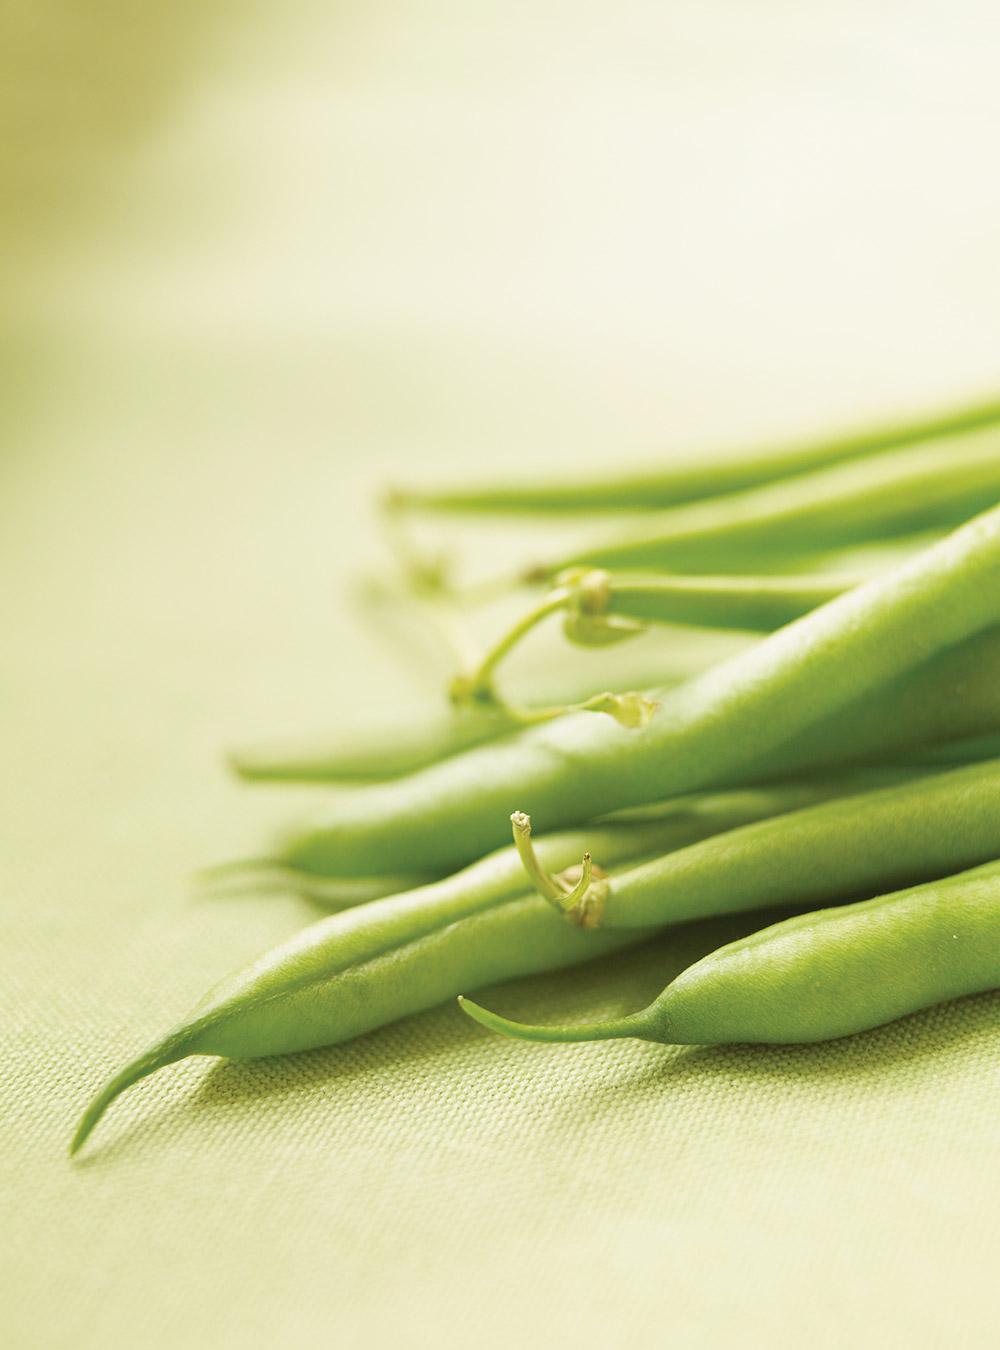 Petite salade de haricots verts | ricardo